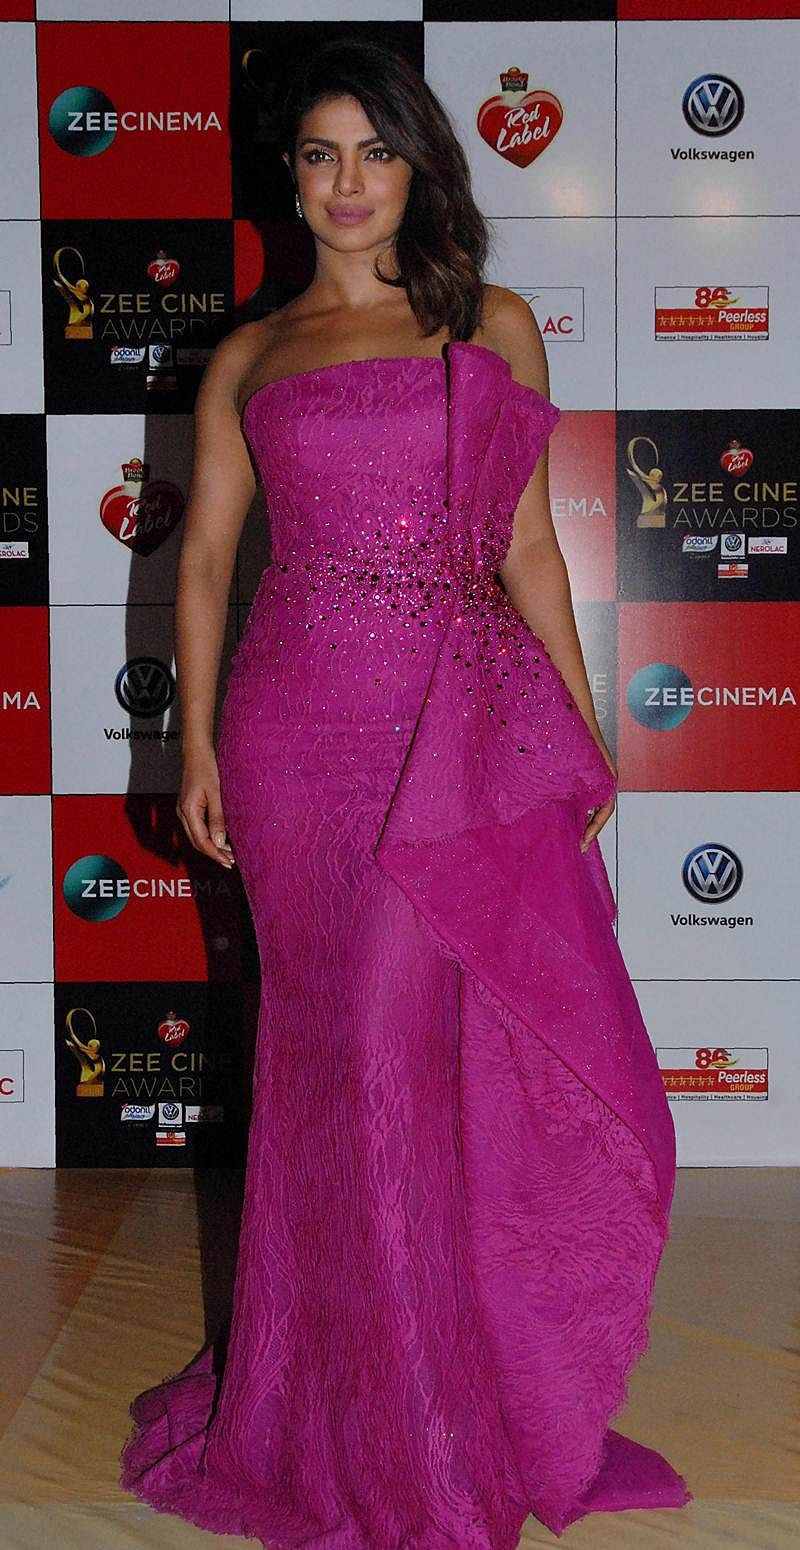 Priyanka Chopra attends the 'Zee Cine Awards 2018' ceremony in Mumbai on December 19, 2017. / AFP PHOTO / Sujit Jaiswal